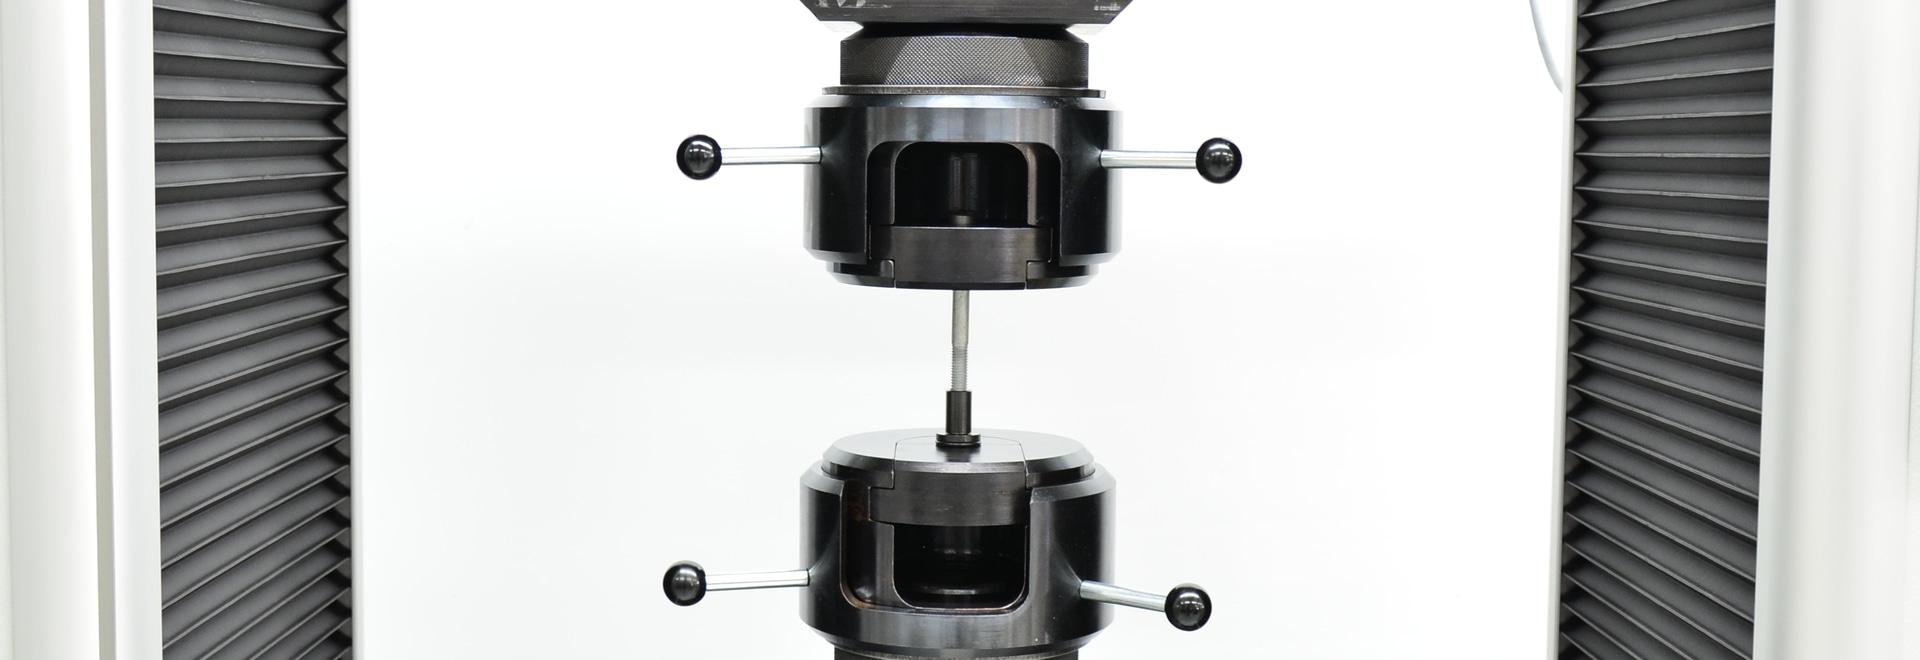 Screw testing machine inspekt 250 kN